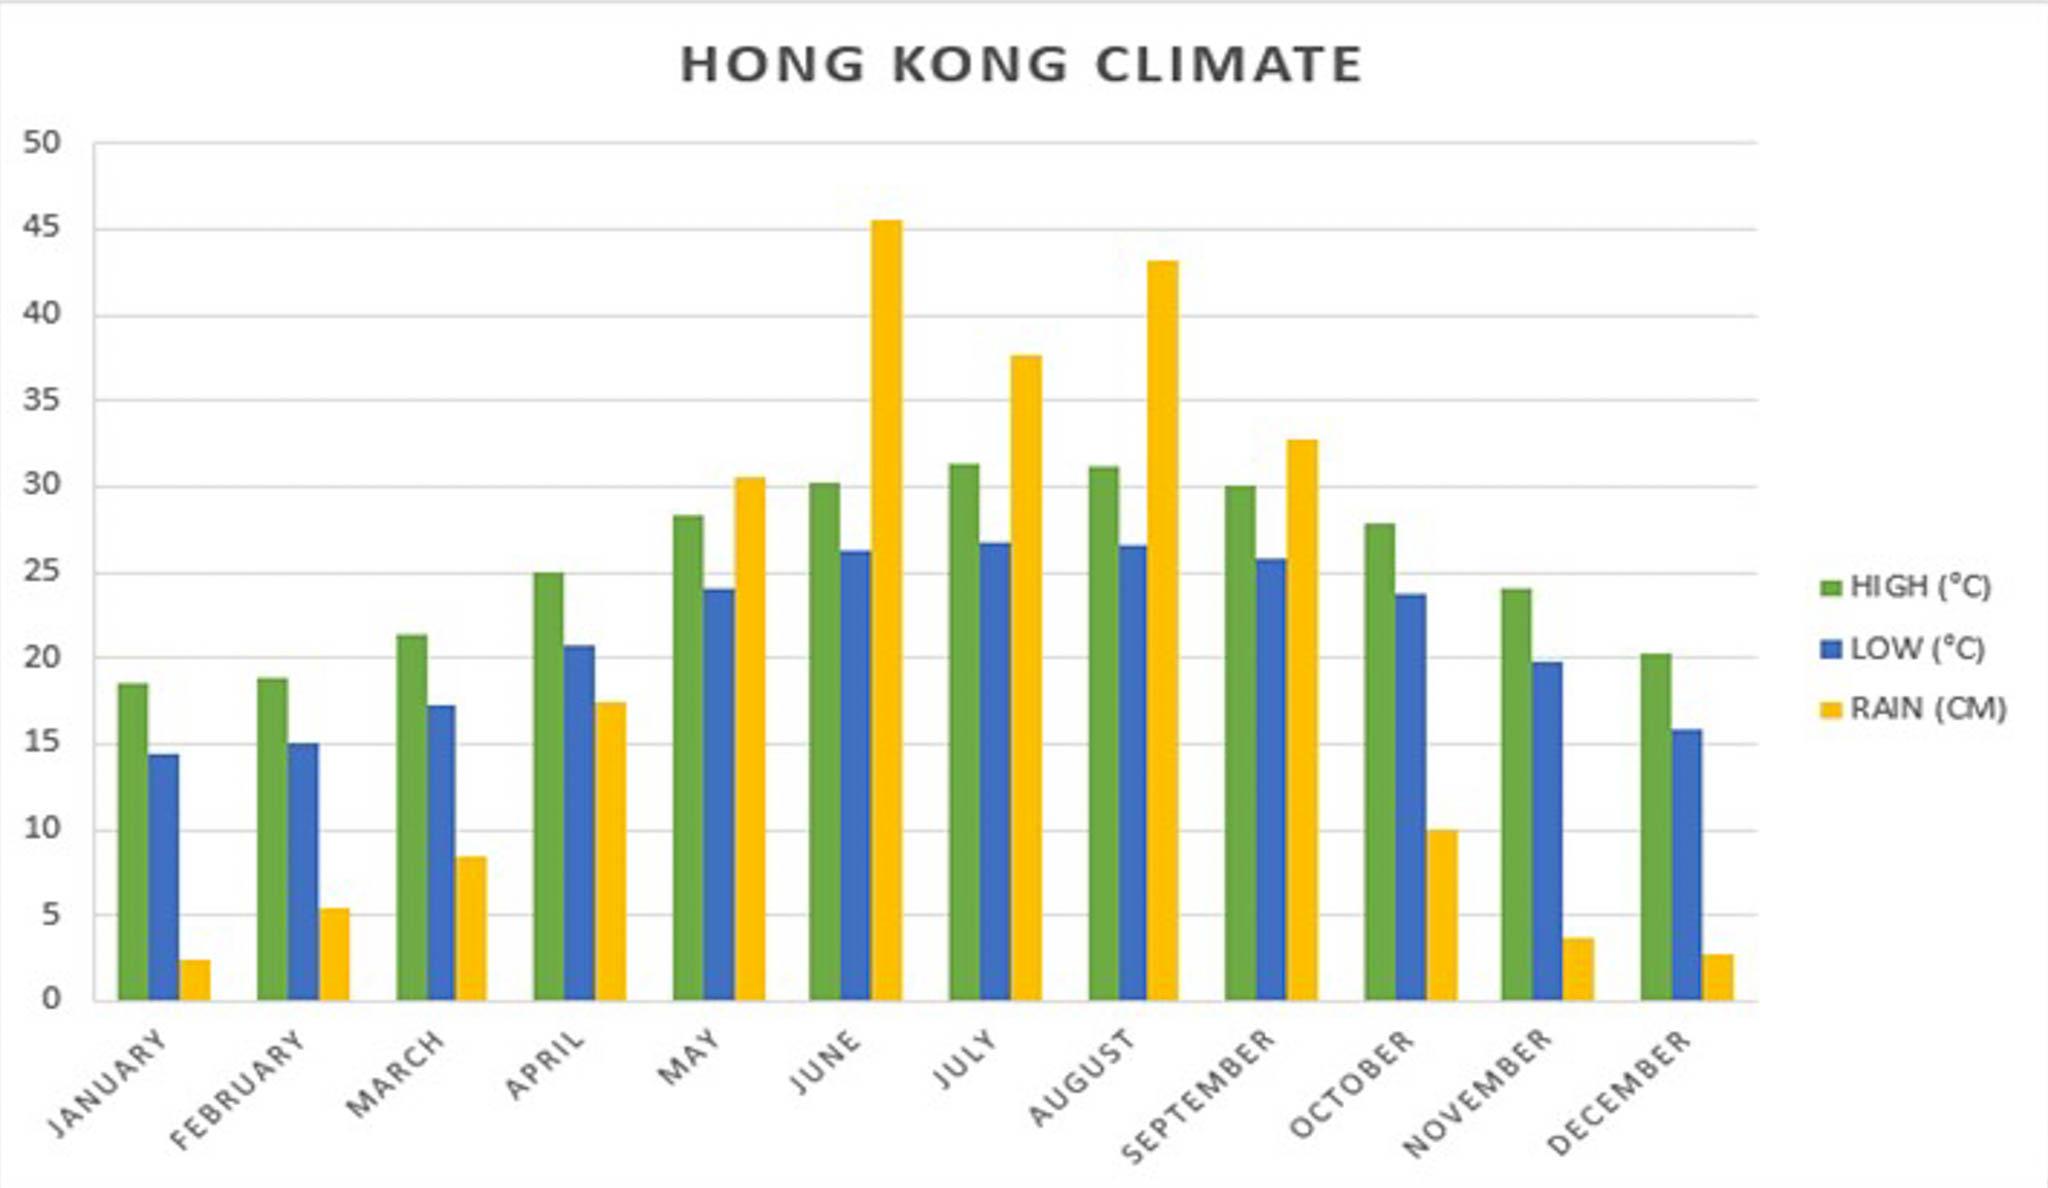 HK CLIMATE